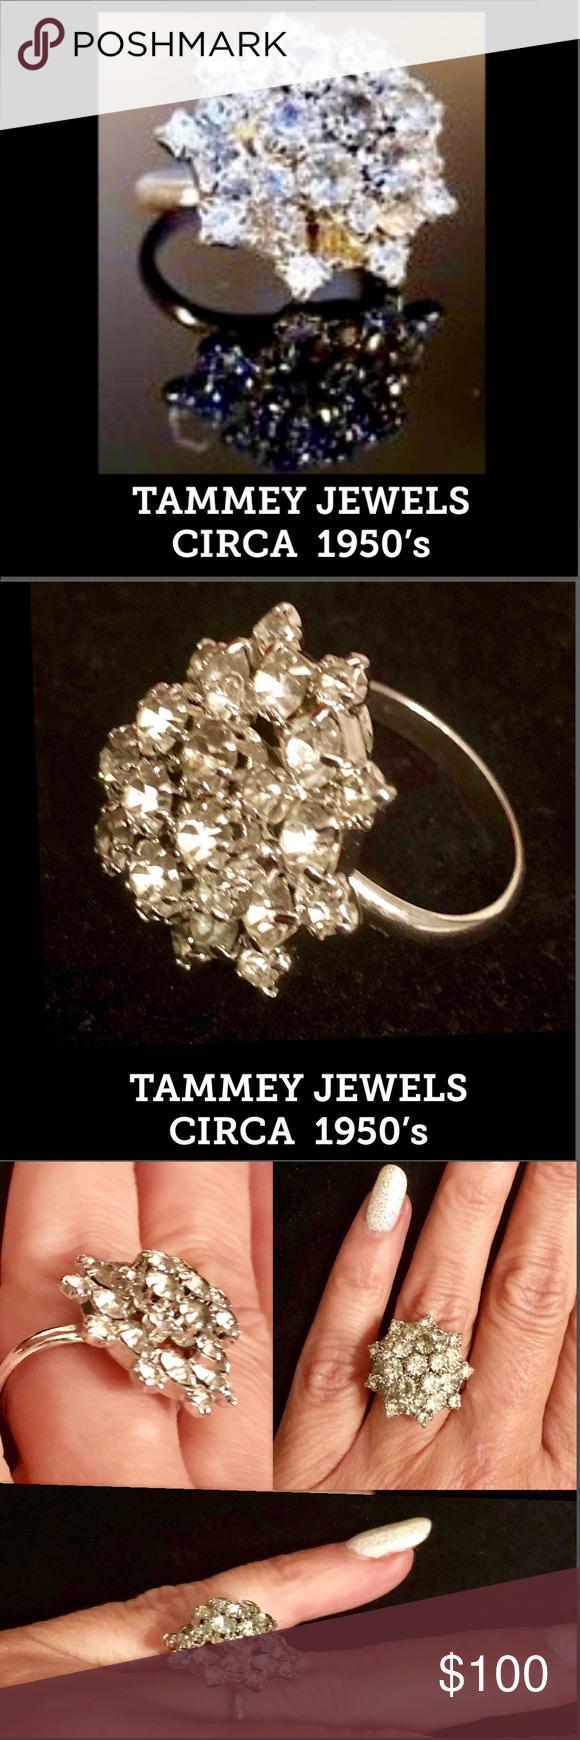 fae62cfce0f0b VINTAGE Circa 1950's TAMMEY JEWELS CLUSTER RING VINTAGE Circa 1950's ...